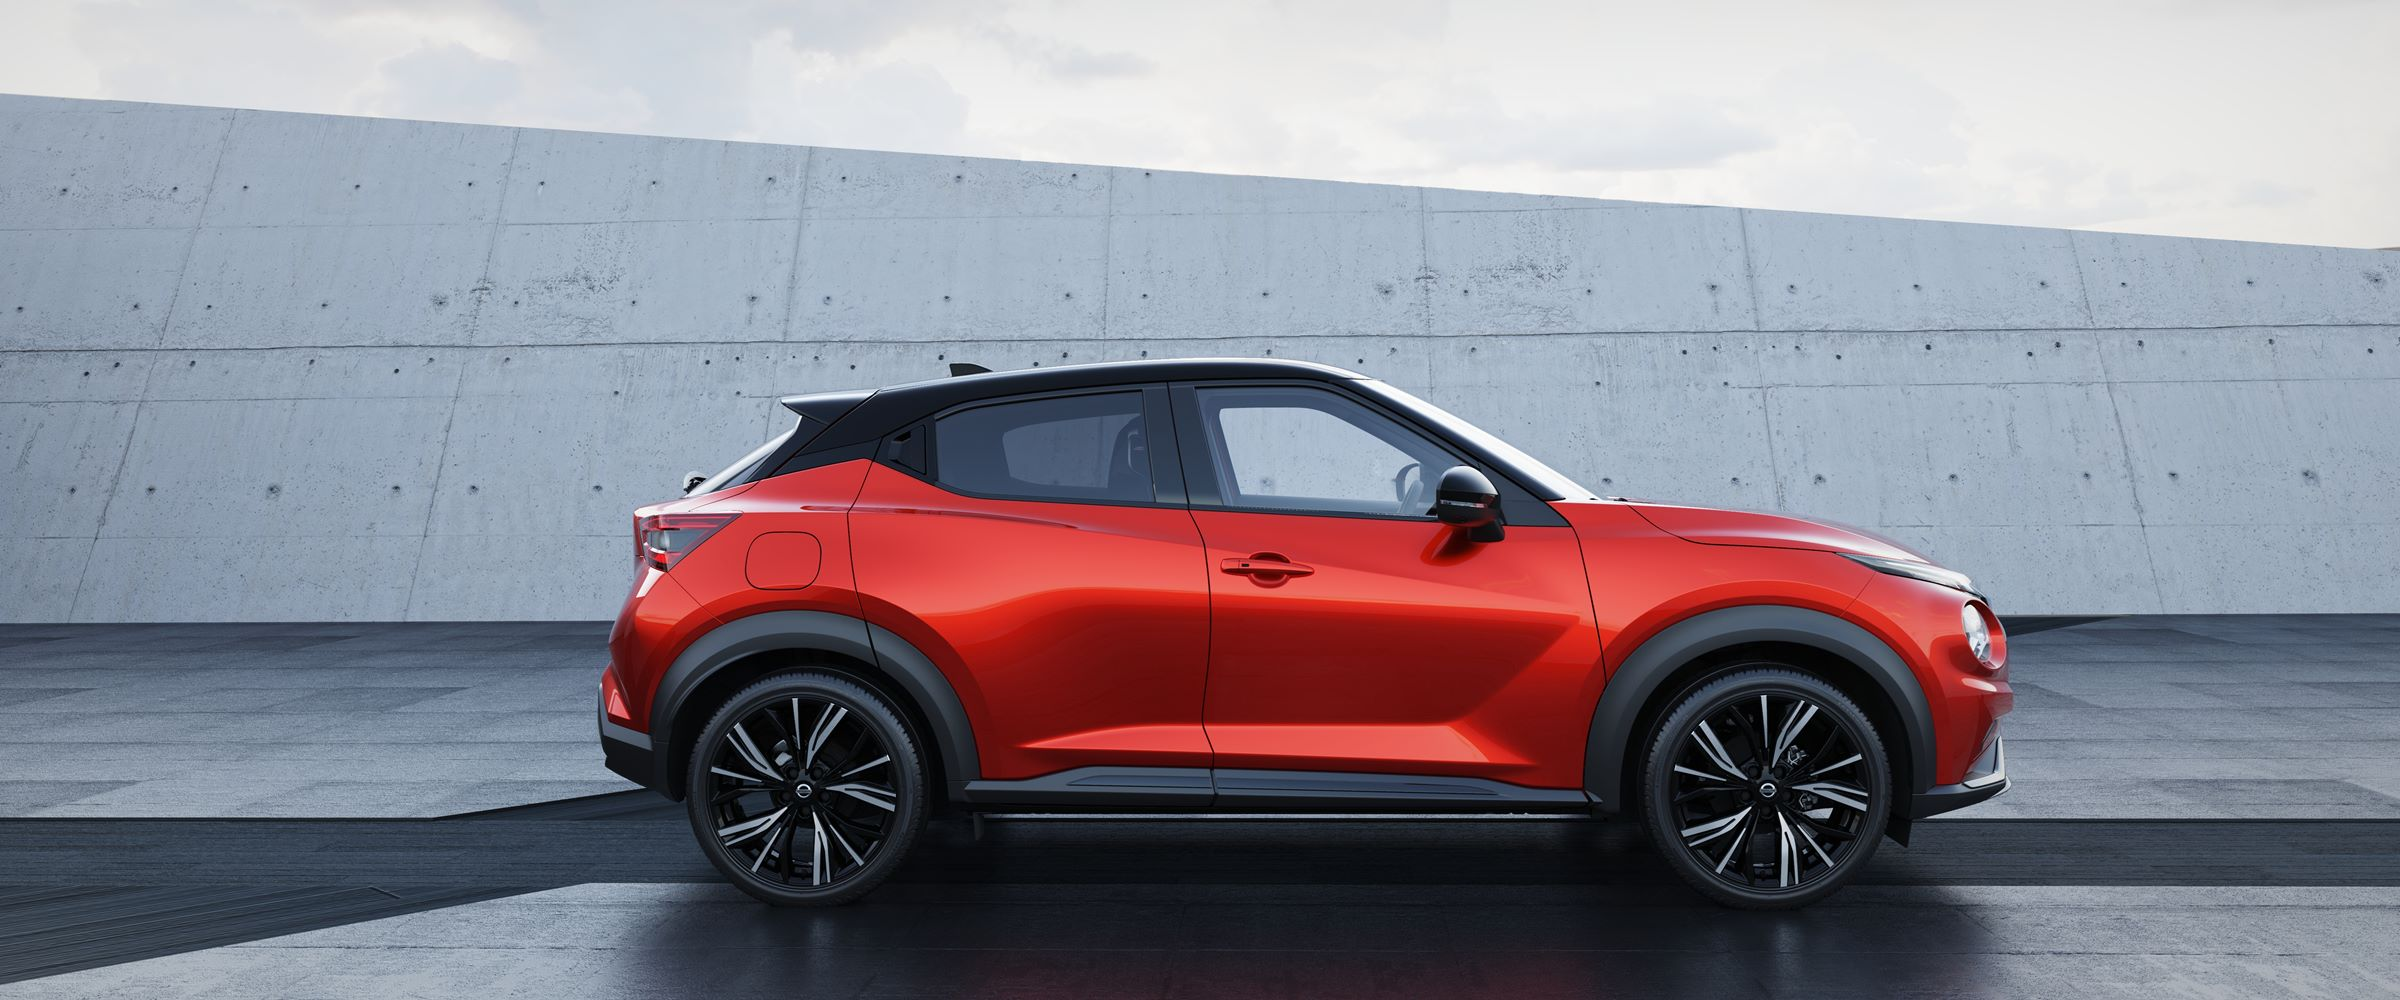 Nissan Juke 2020 zdjęcia